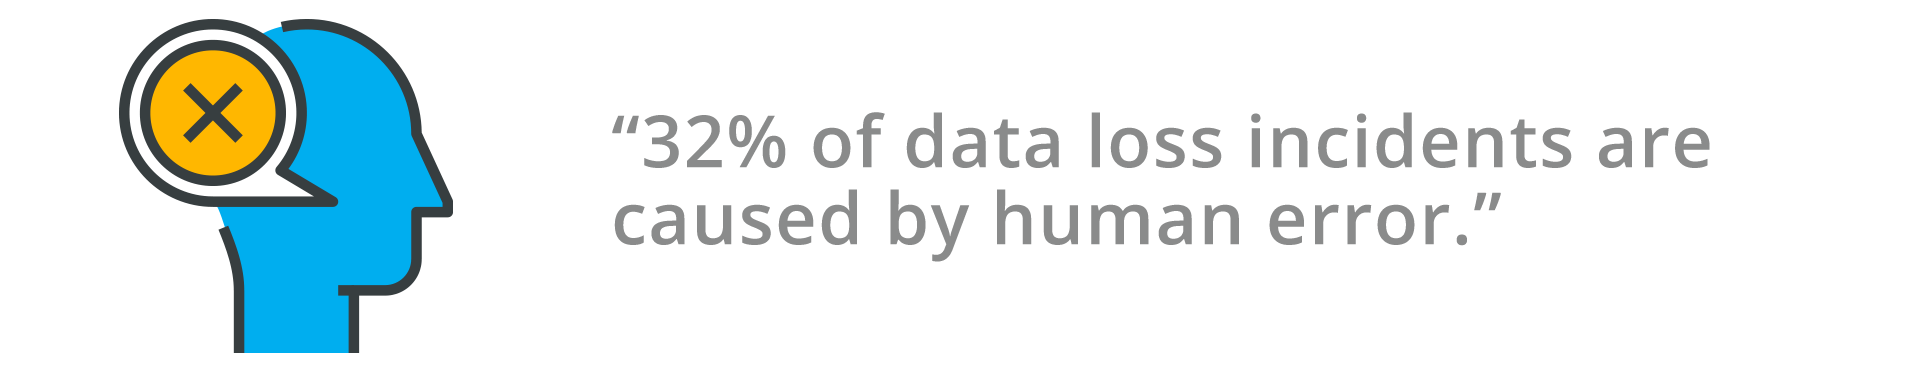 human error stat